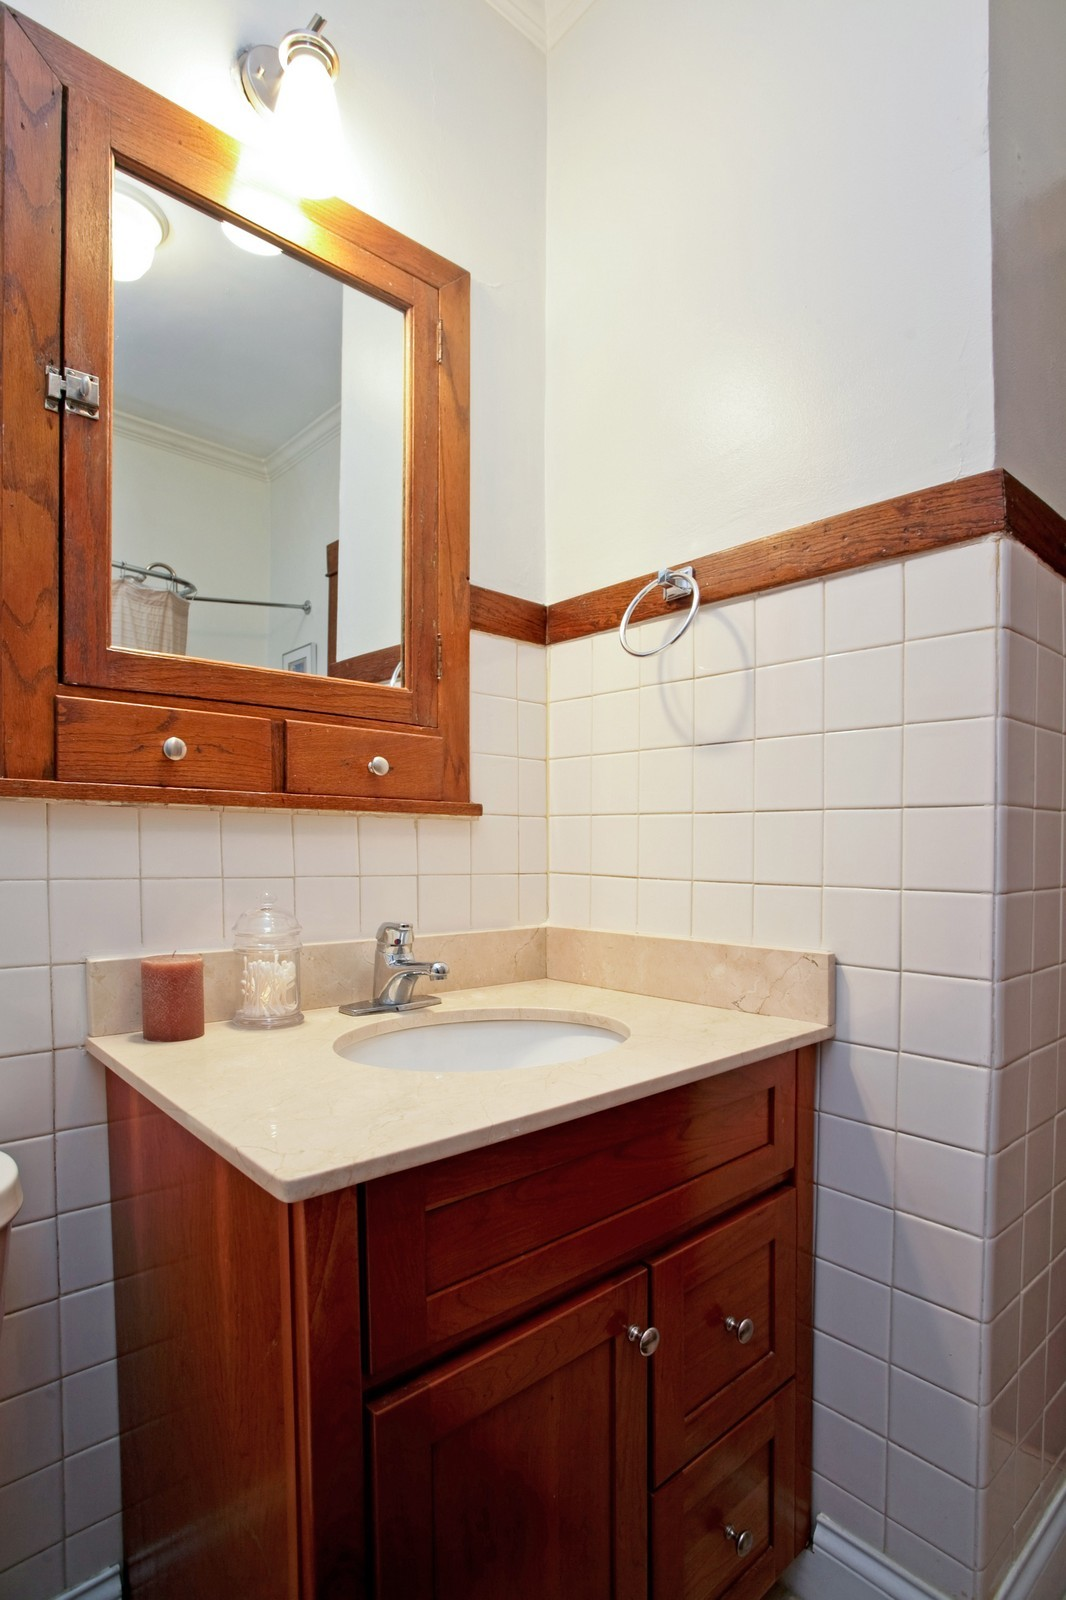 Real Estate Photography - 4113 N Ashland, Chicago, IL, 60613 - 2nd Bathroom